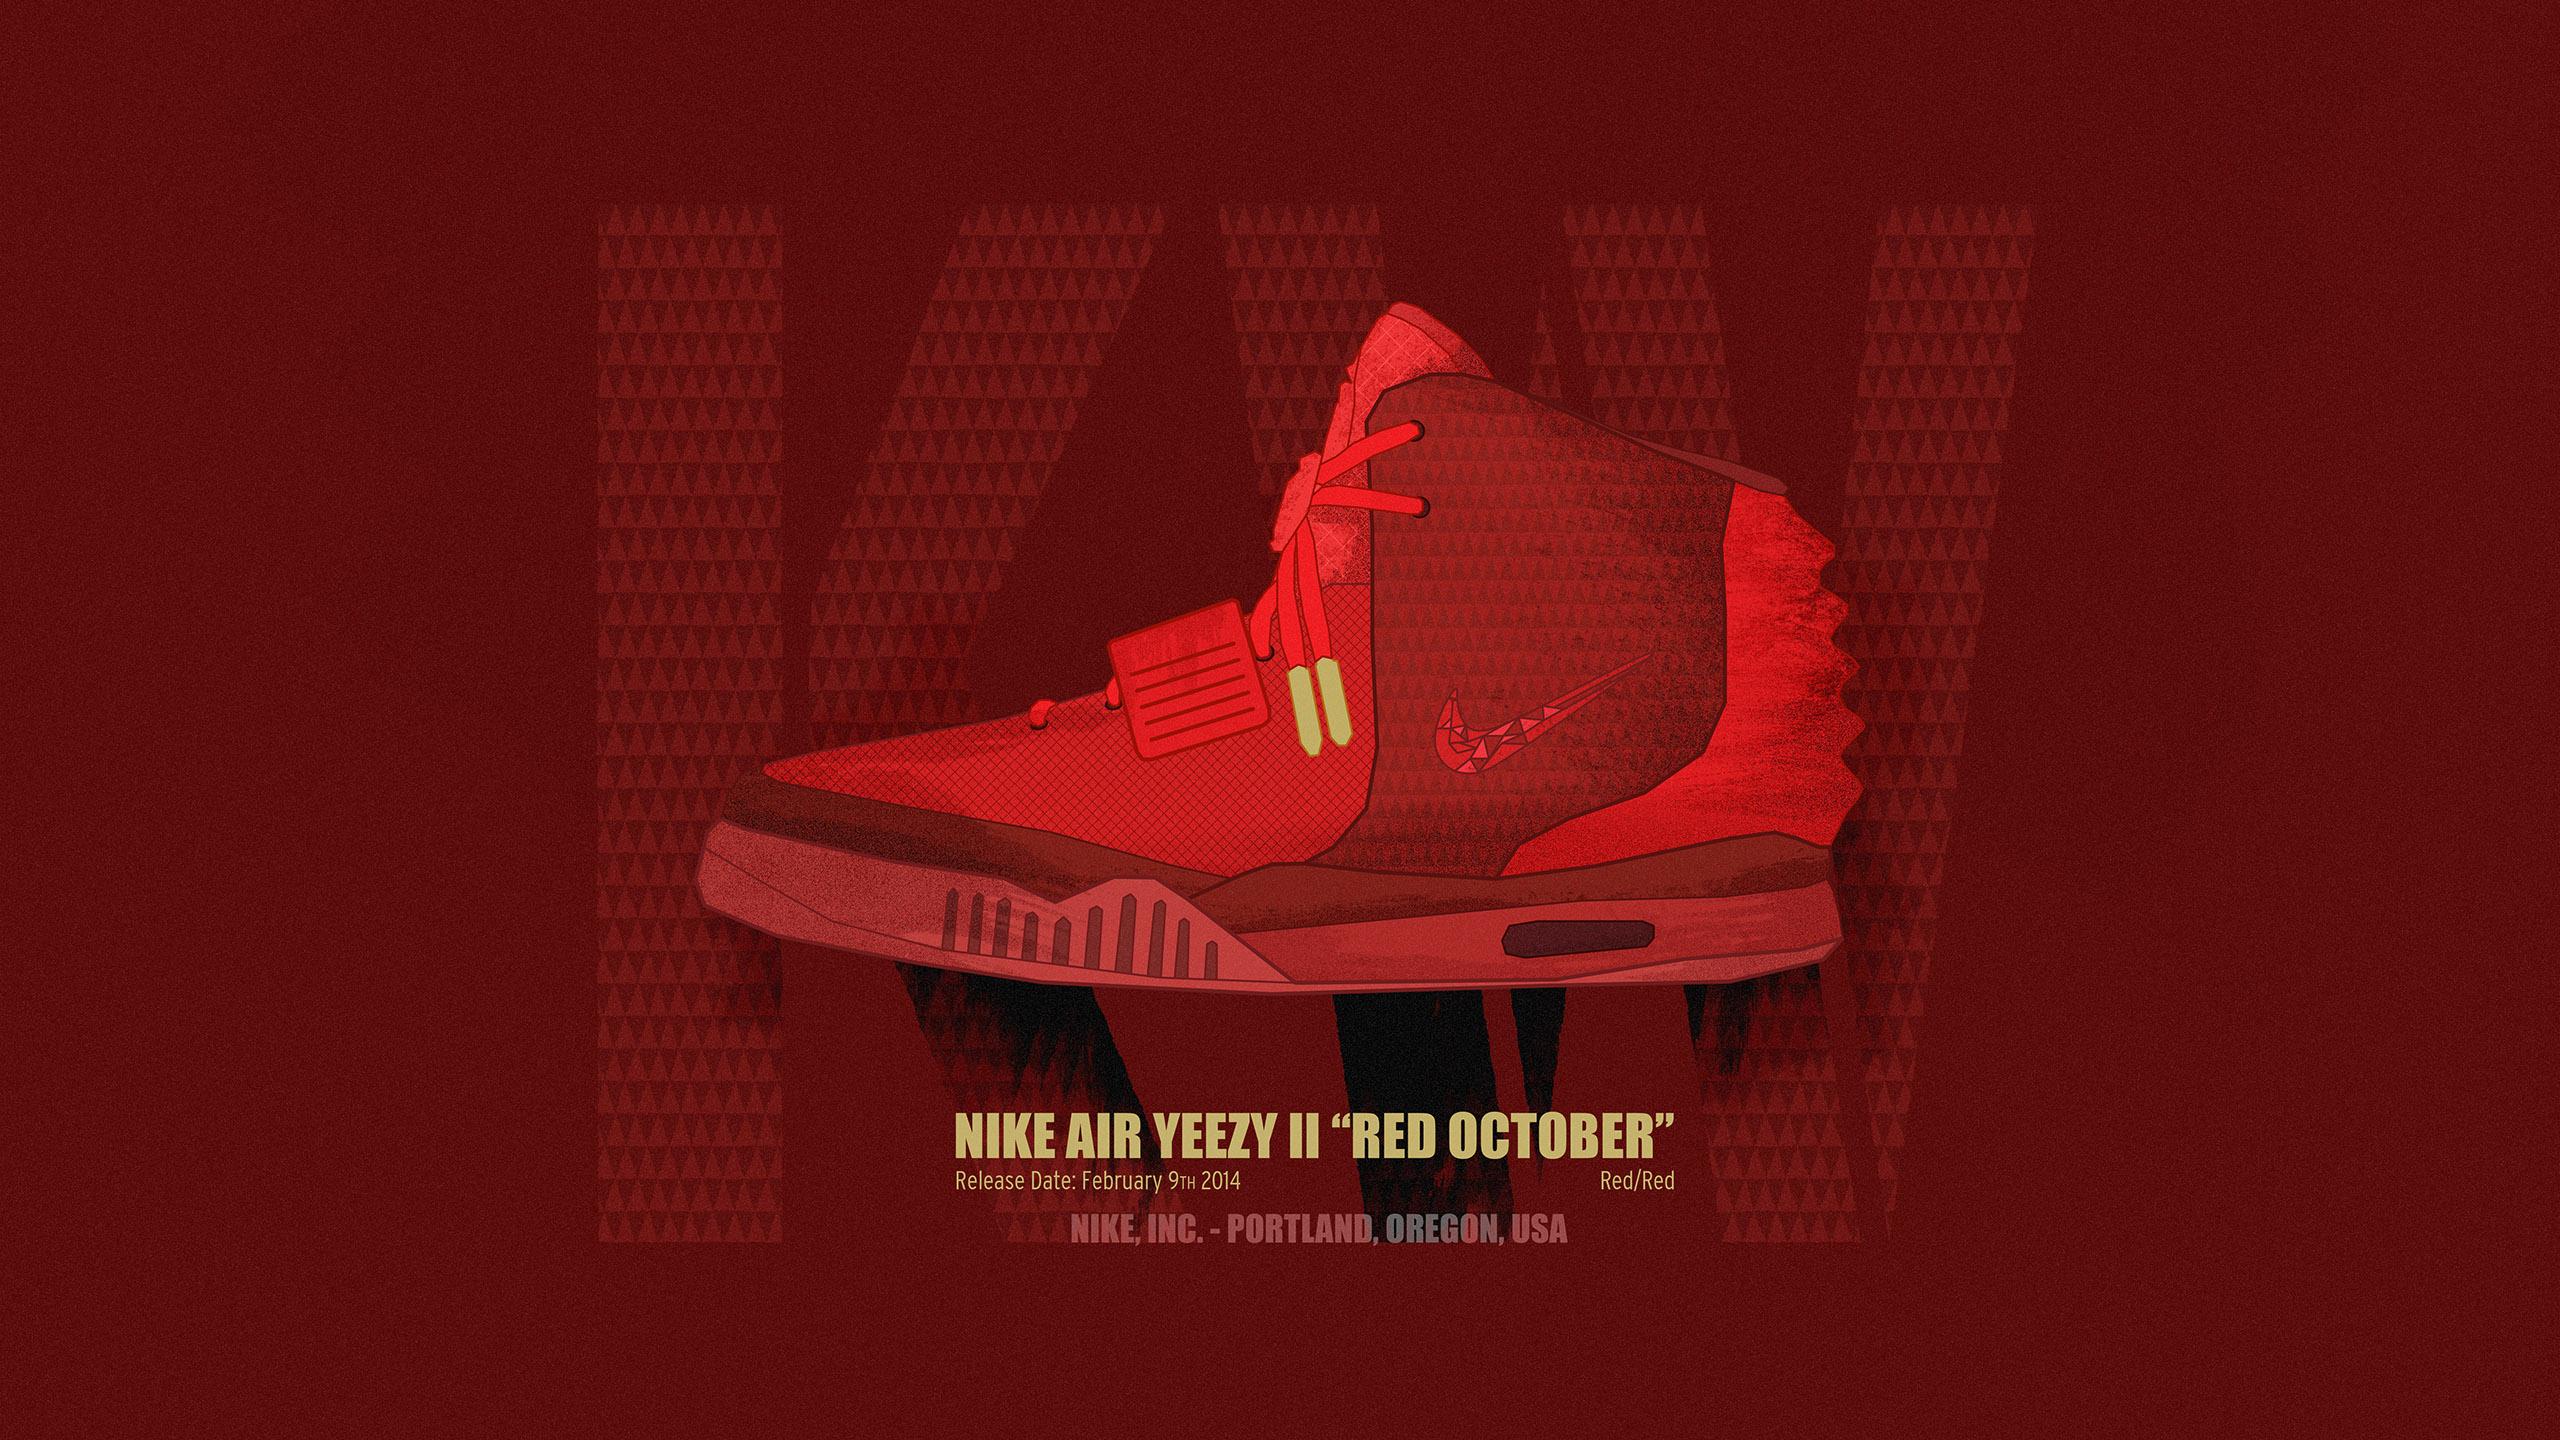 Yeezy 2 Red October Wallpaper wwwgalleryhipcom   The 2560x1440